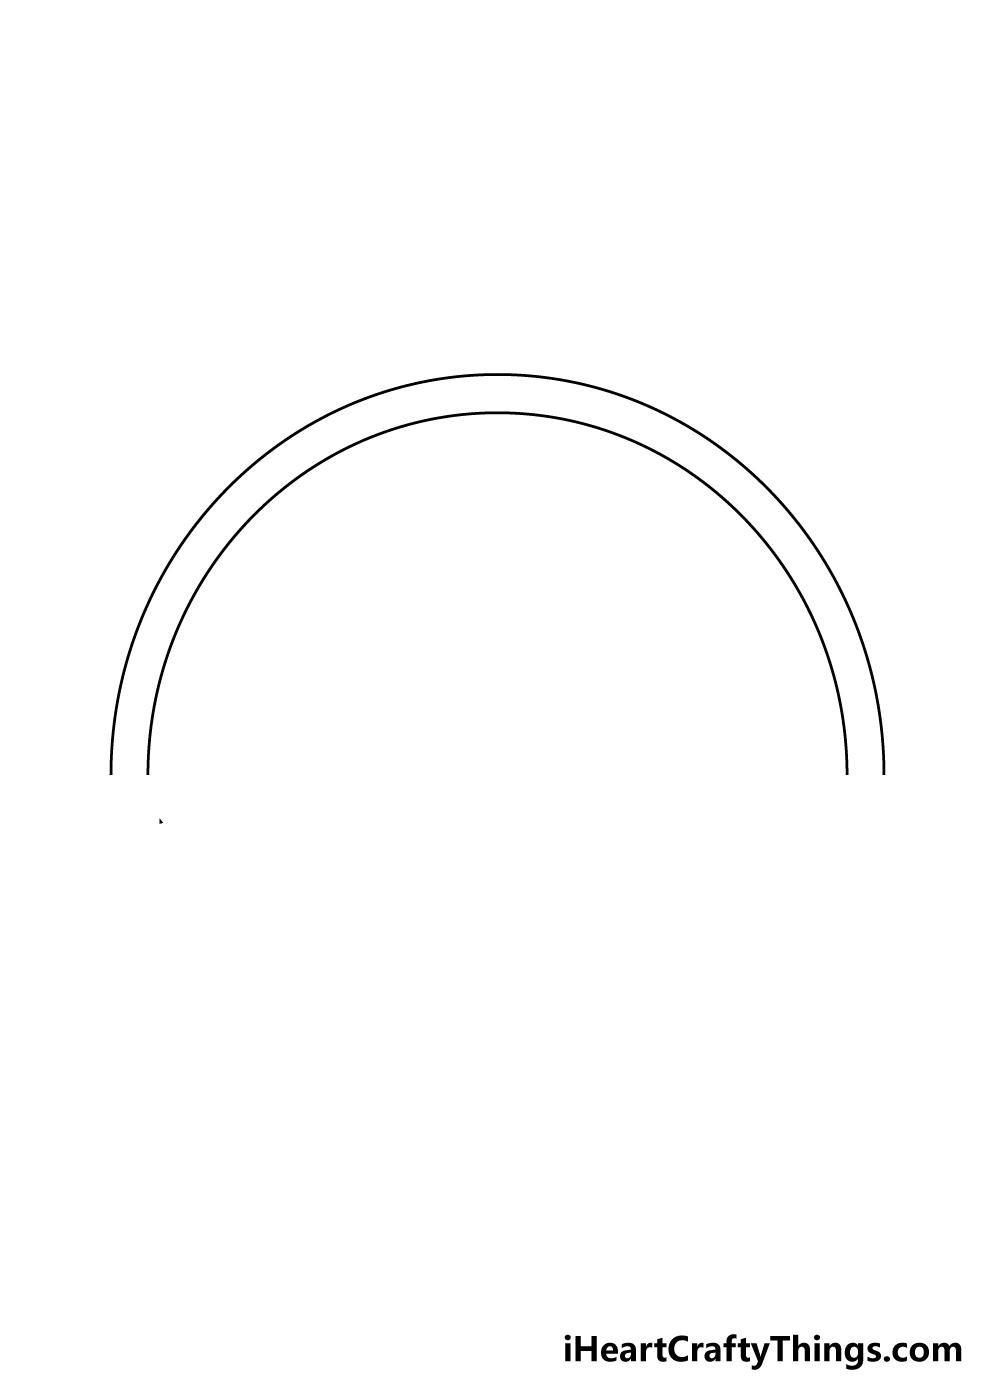 drawing a rainbow step 2